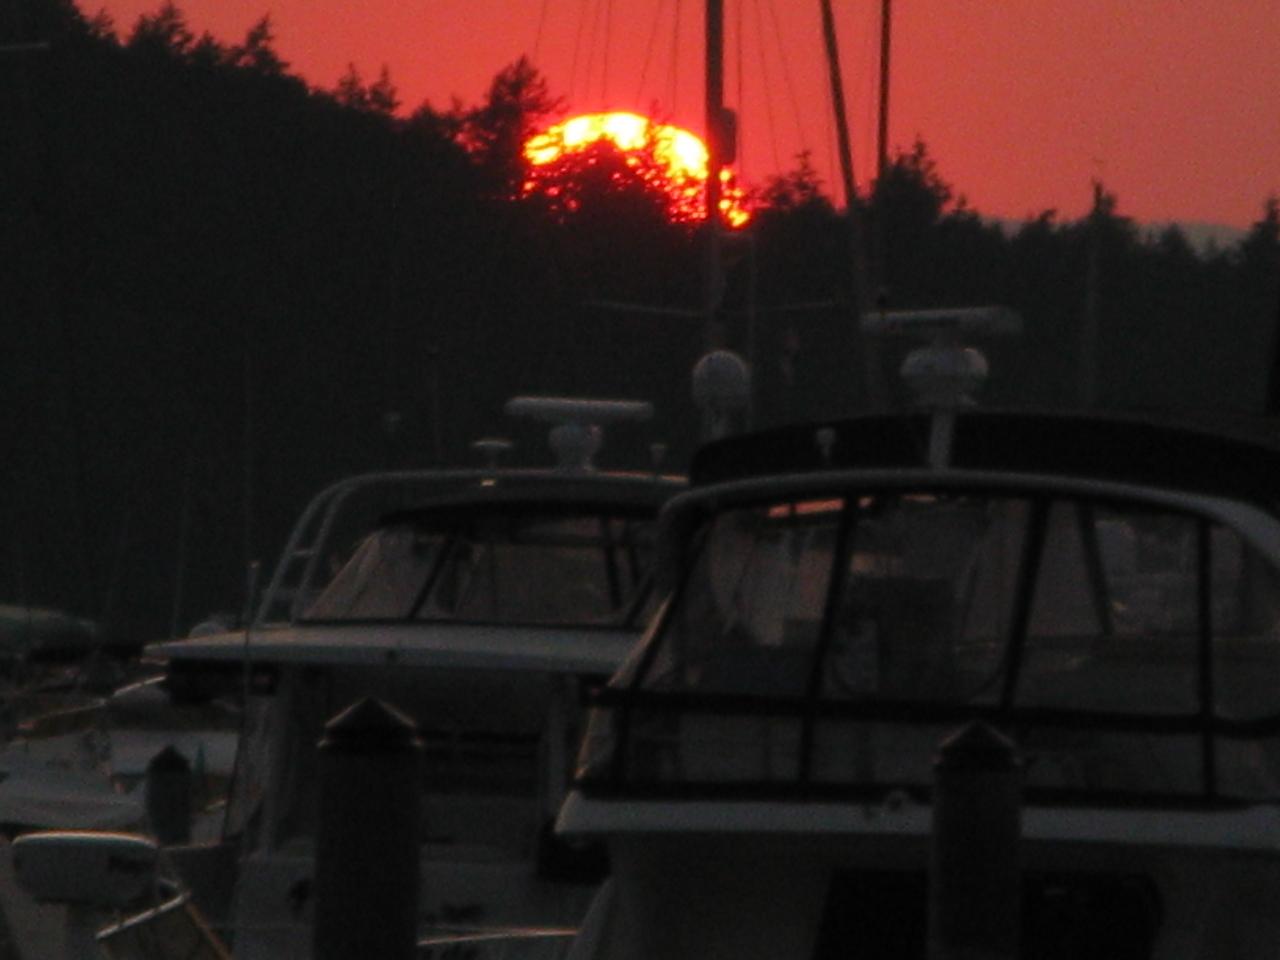 09 07 26-08 02 Sail SJ 195